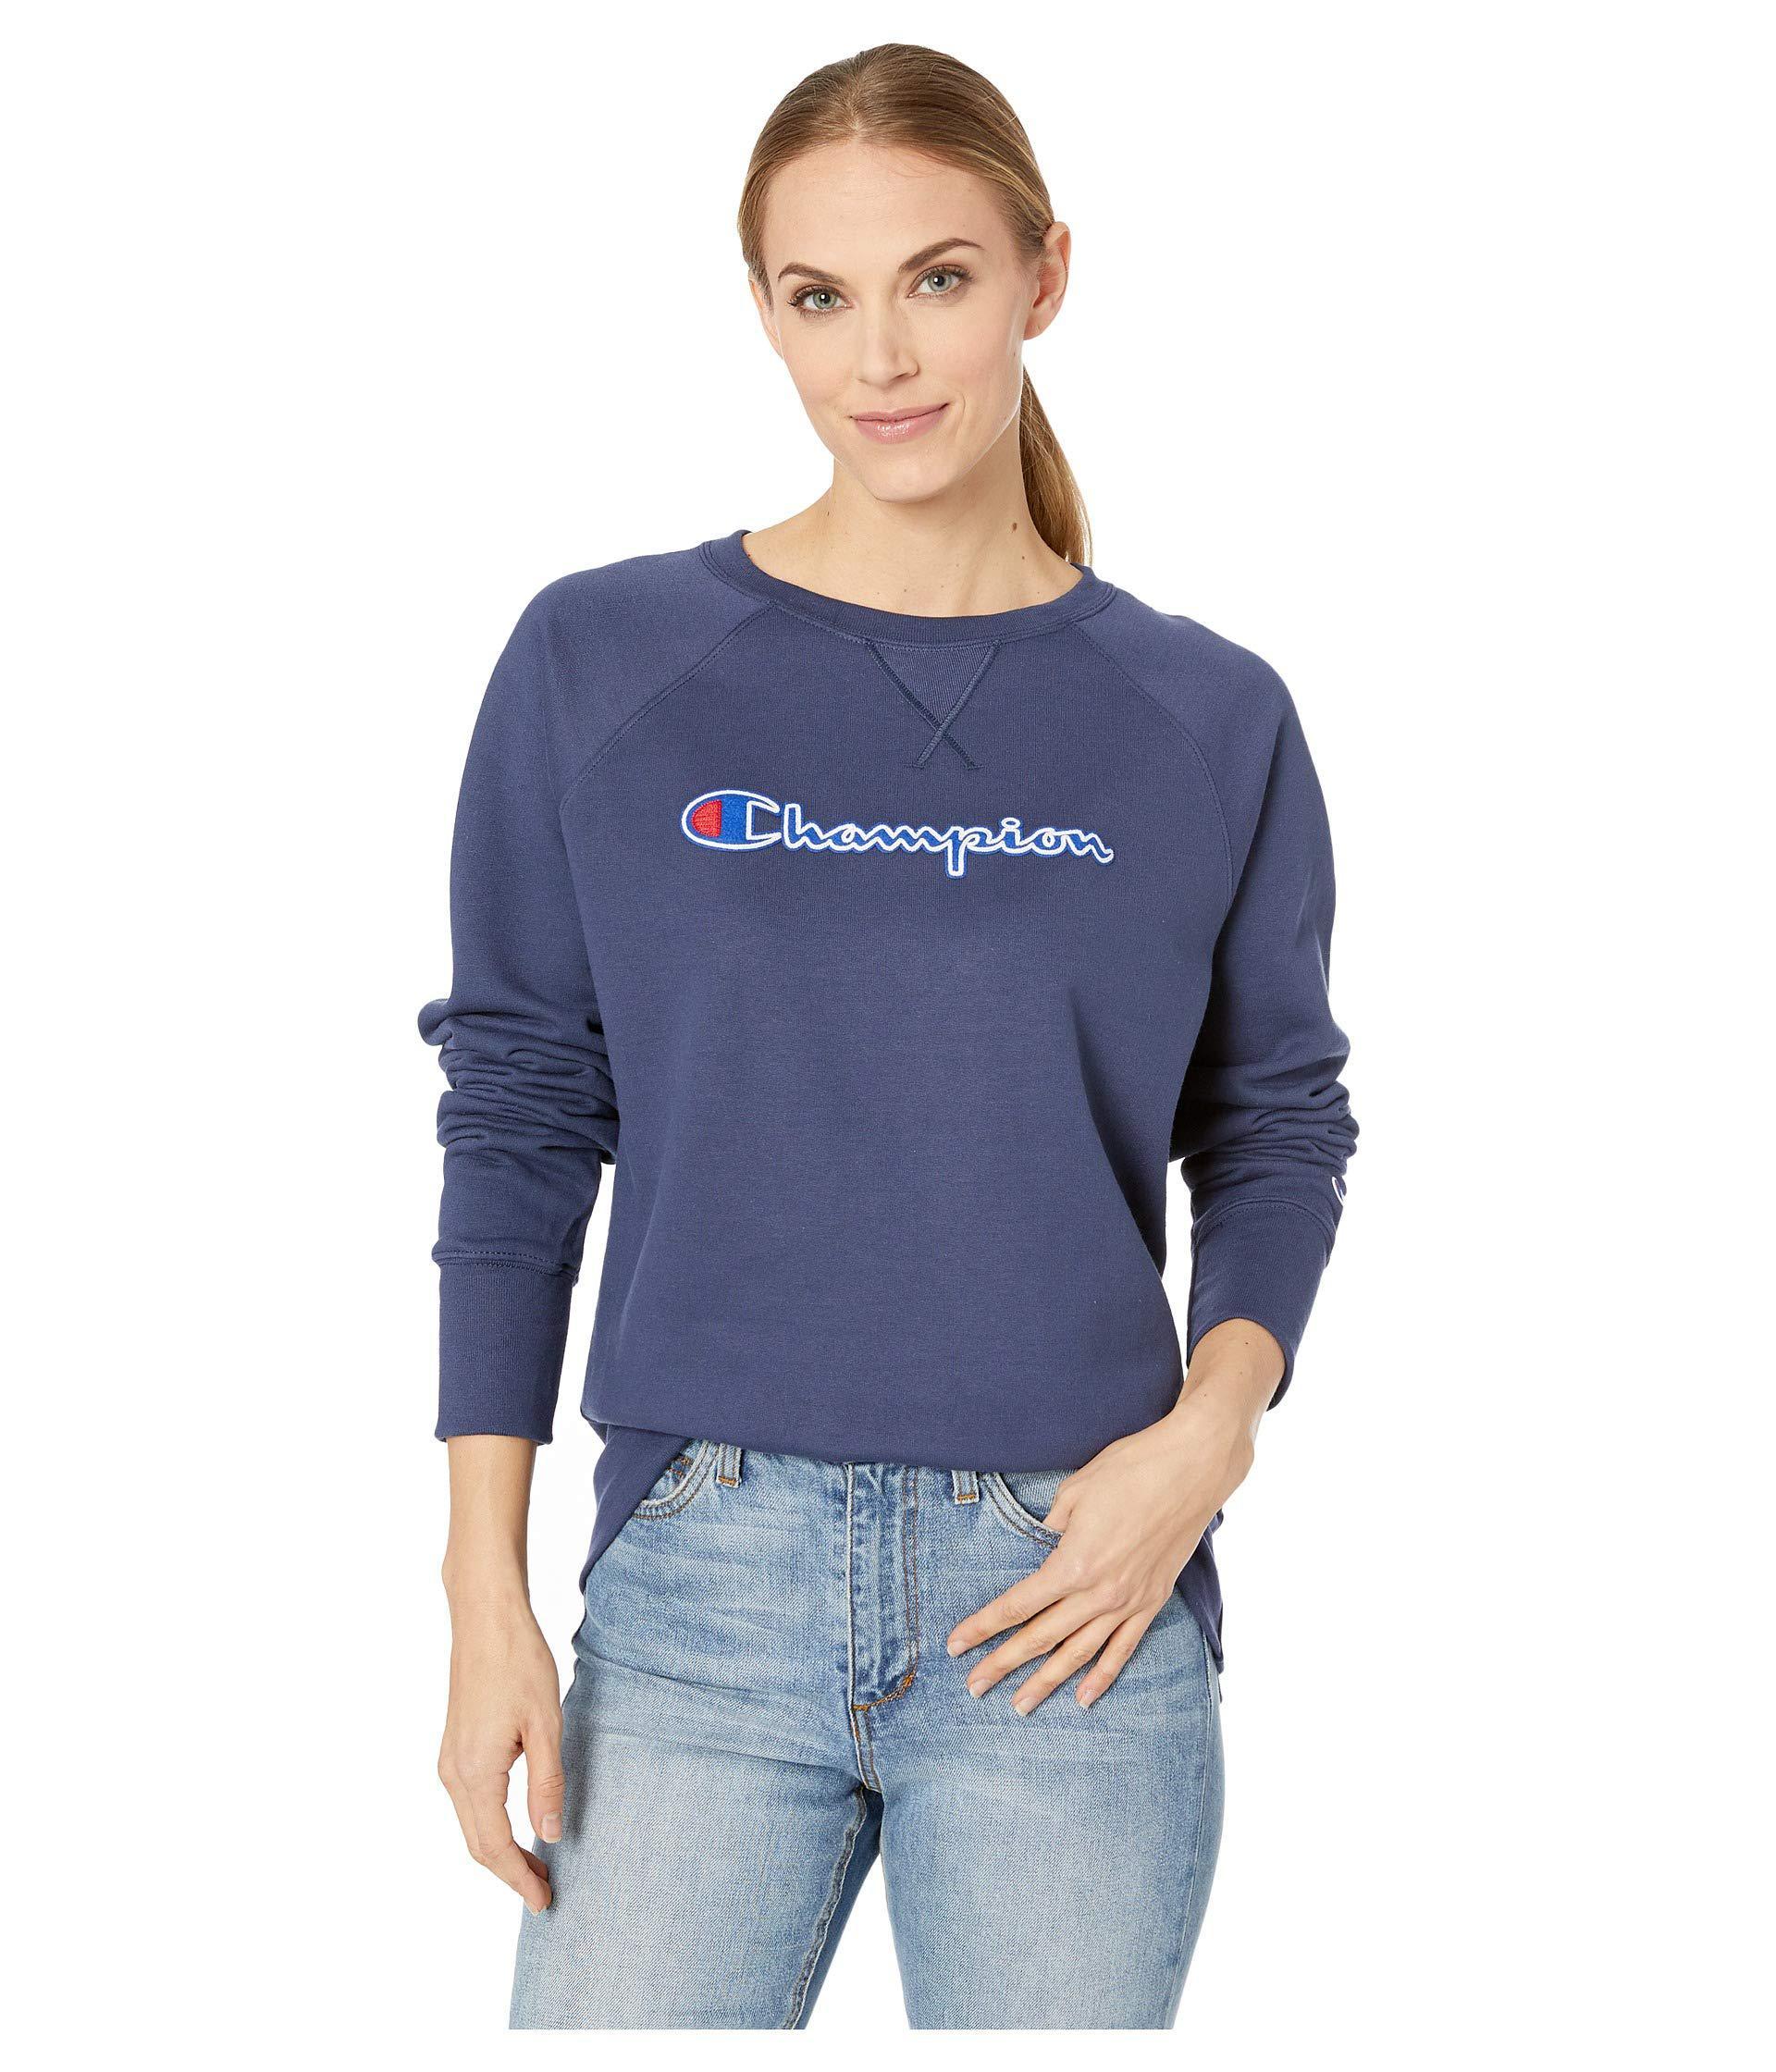 Champion Womens Powerblend/¿ Fleece Boyfriend Crew Applique Y07461